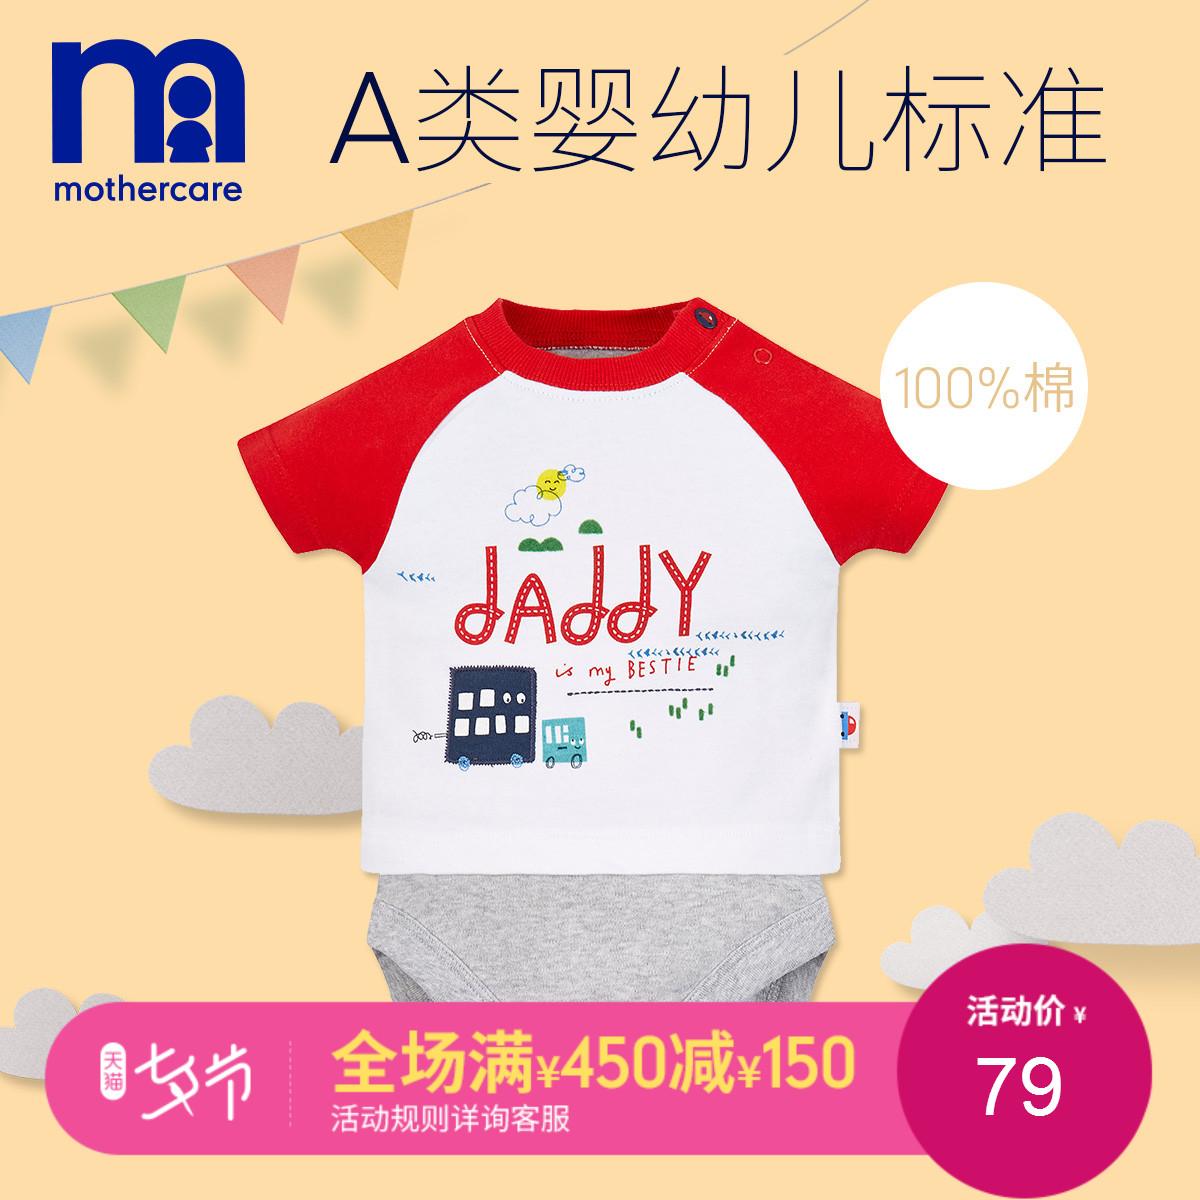 mothercare英国男婴针织连体衣2018春夏短袖新生儿宝宝哈衣